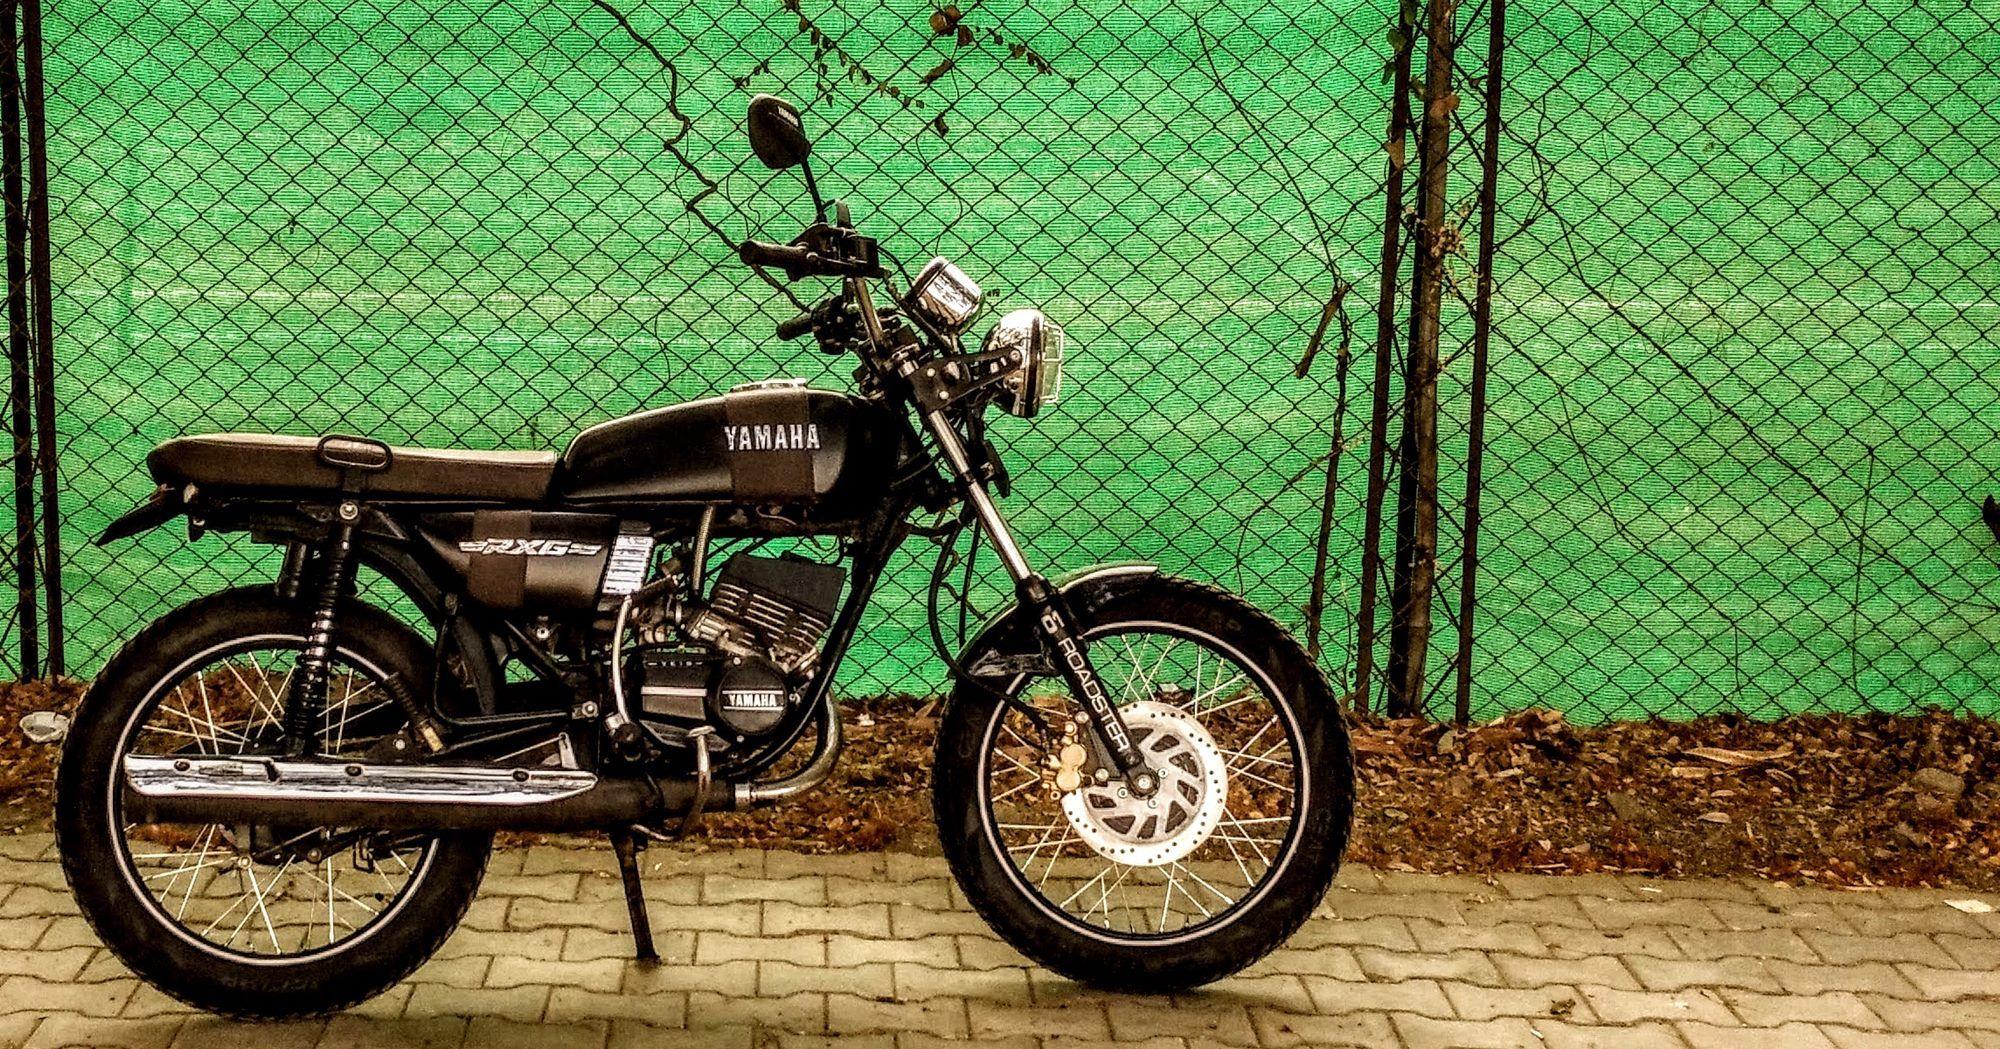 Yamaha Rx 135 Restoration By Studio 21 Design 350cc Com Yamaha